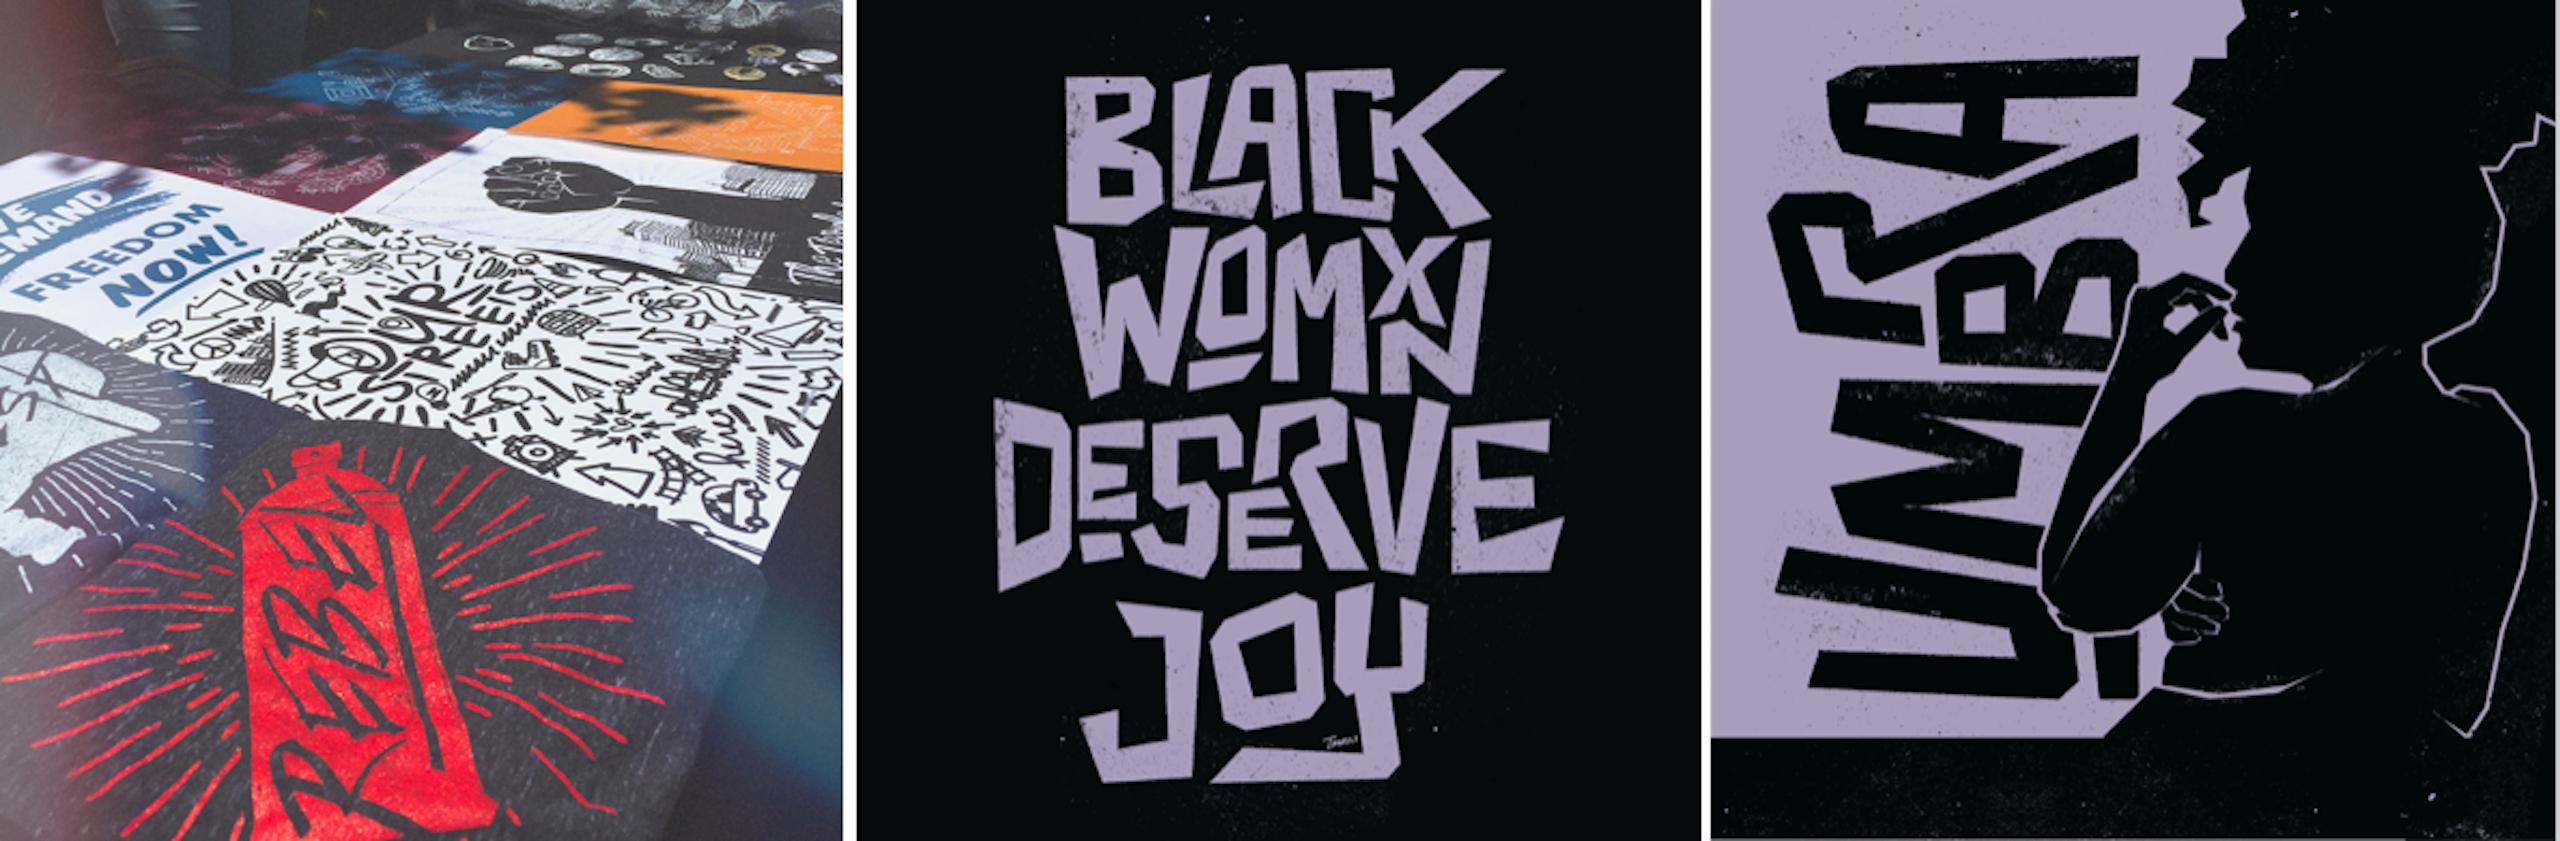 Blackbird Revolt graphic design images